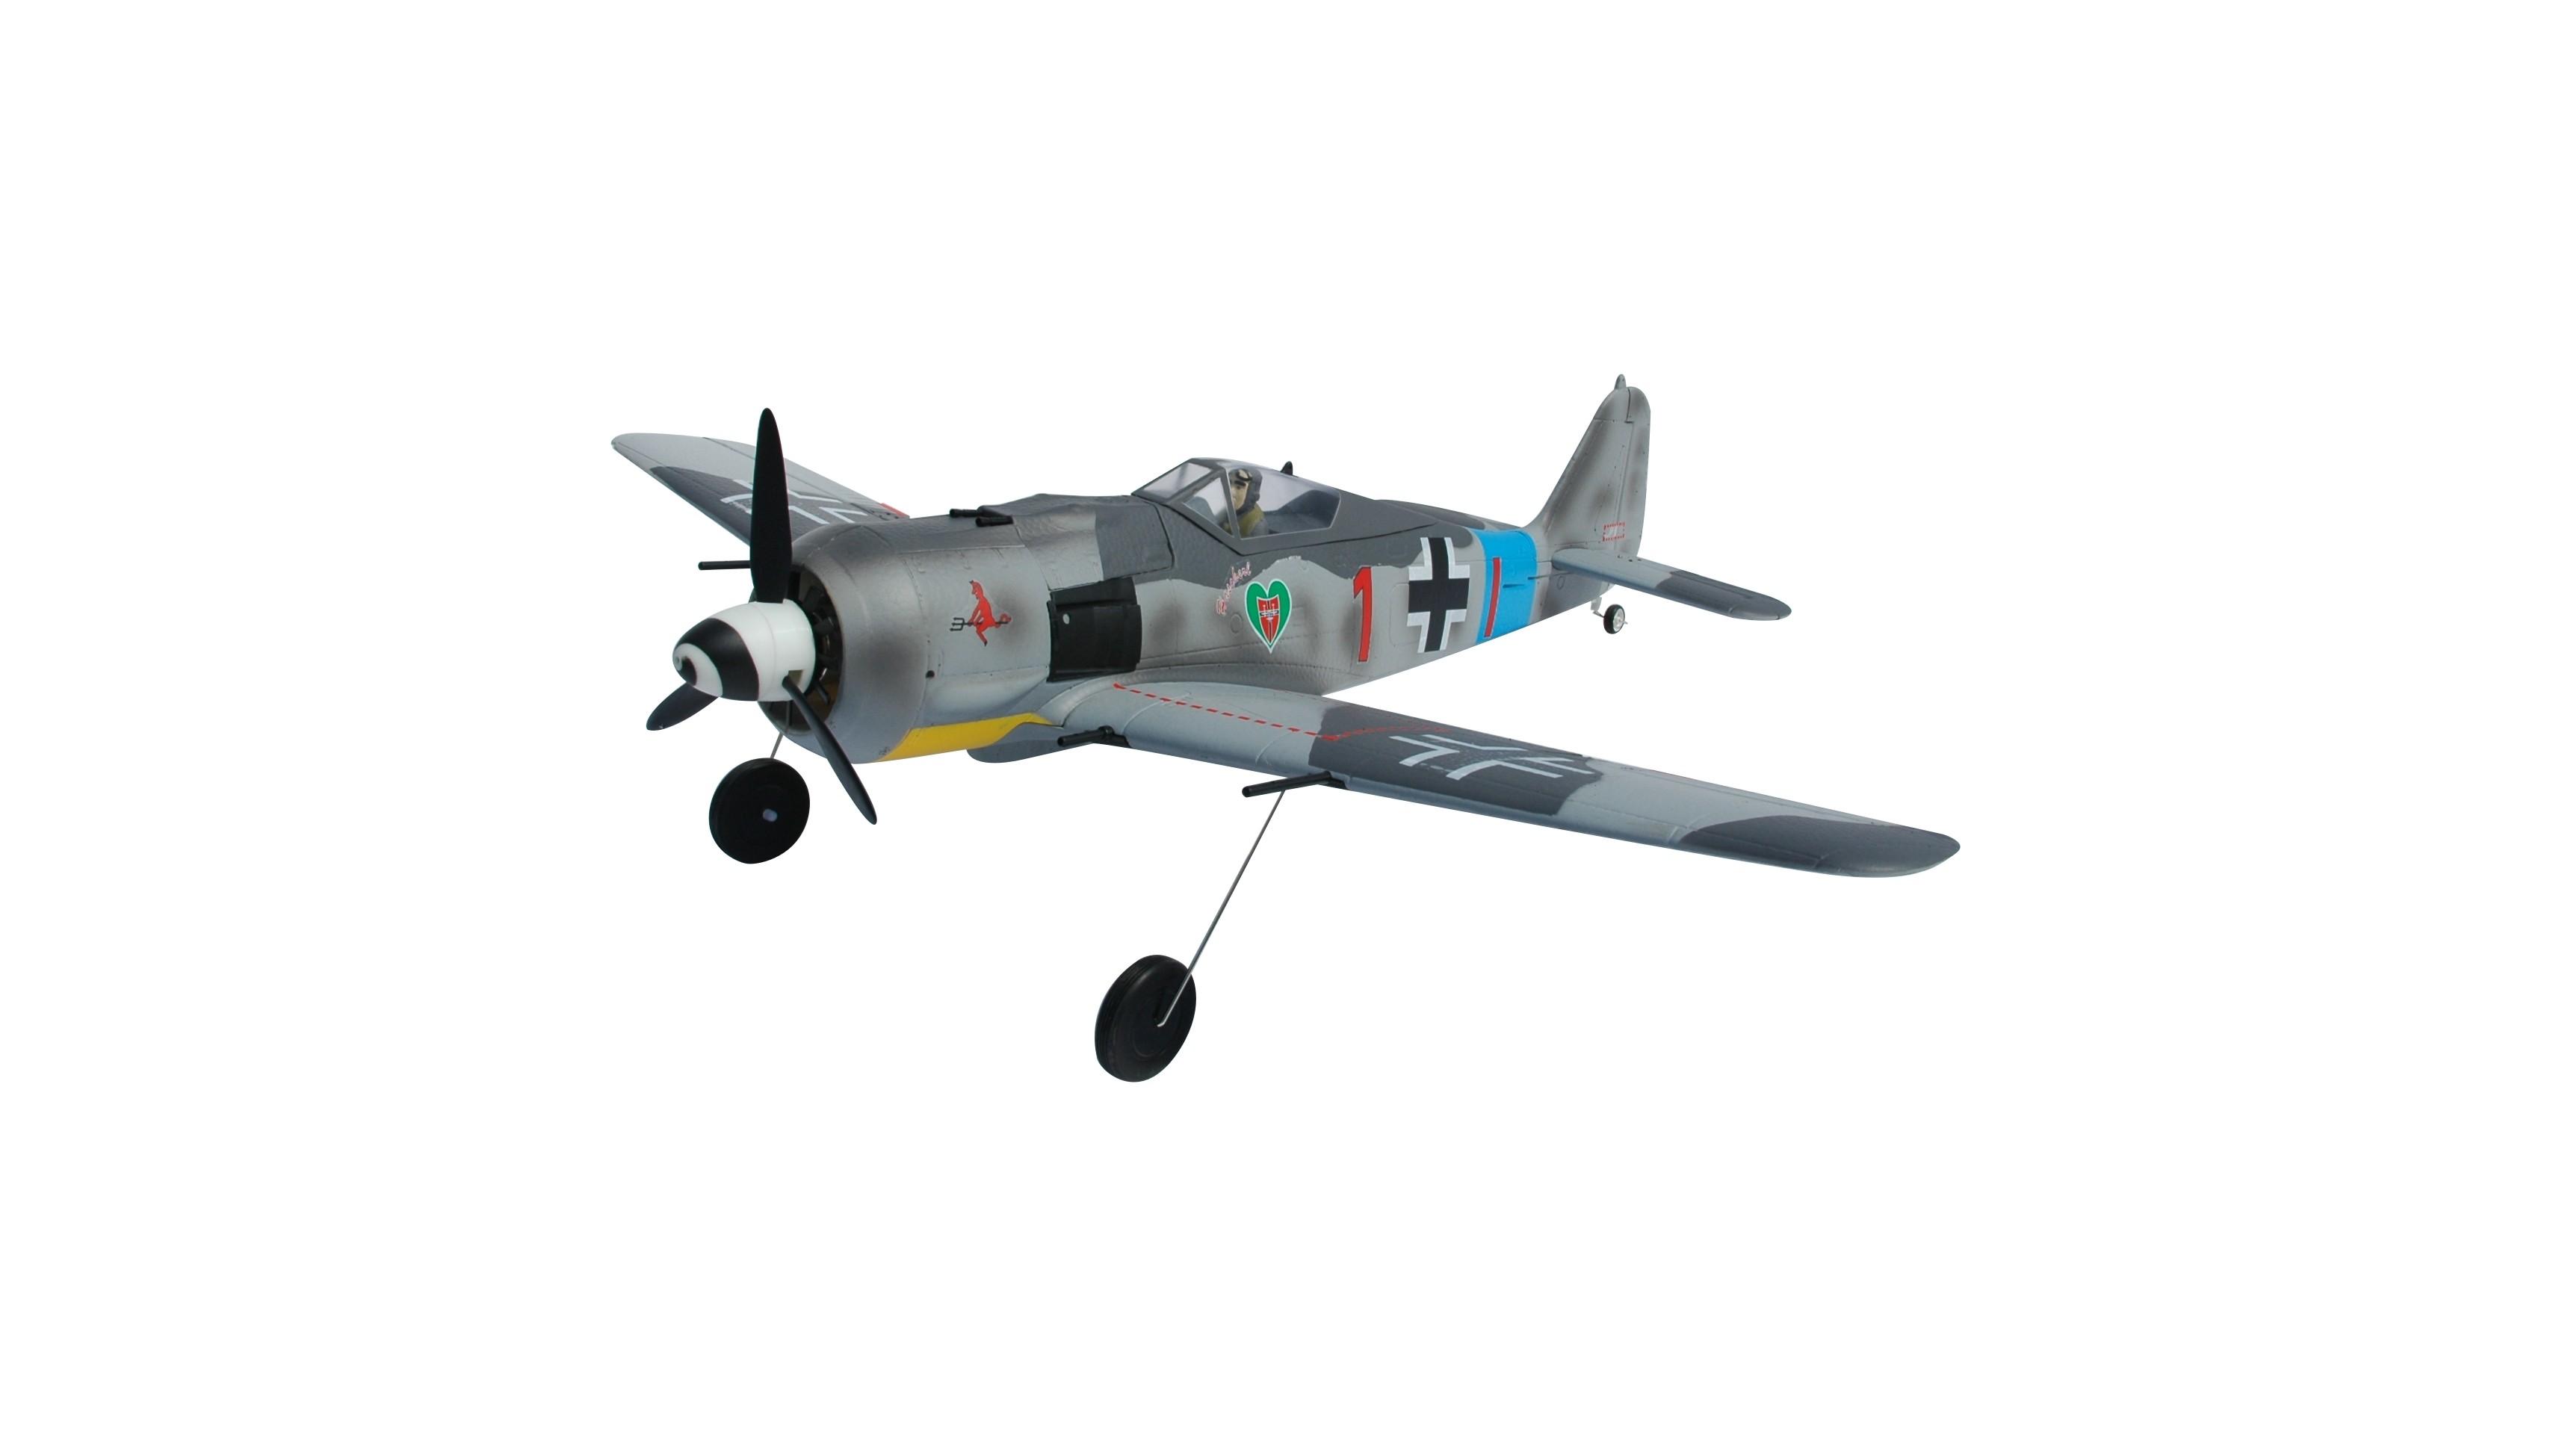 fw190-a8  camo  750mm mini warbird kit - modelisme